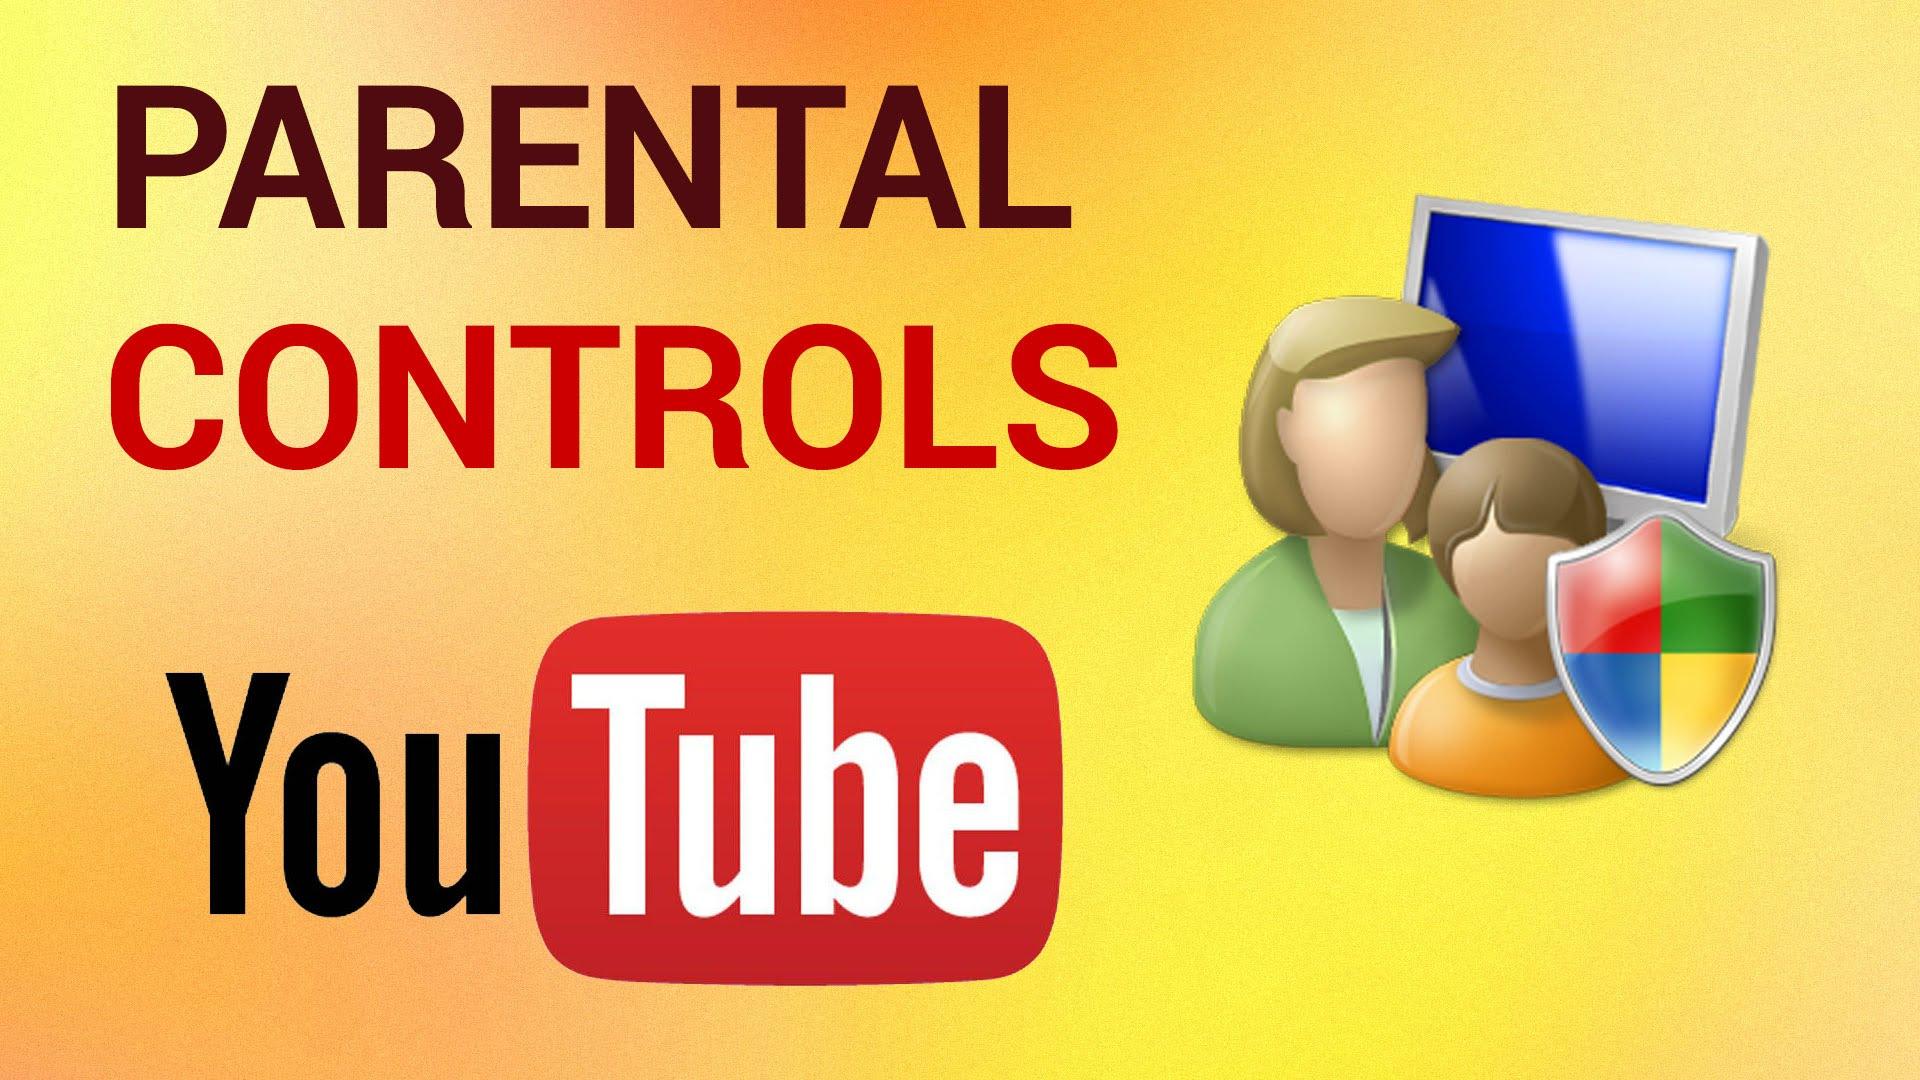 Parental Control you tube